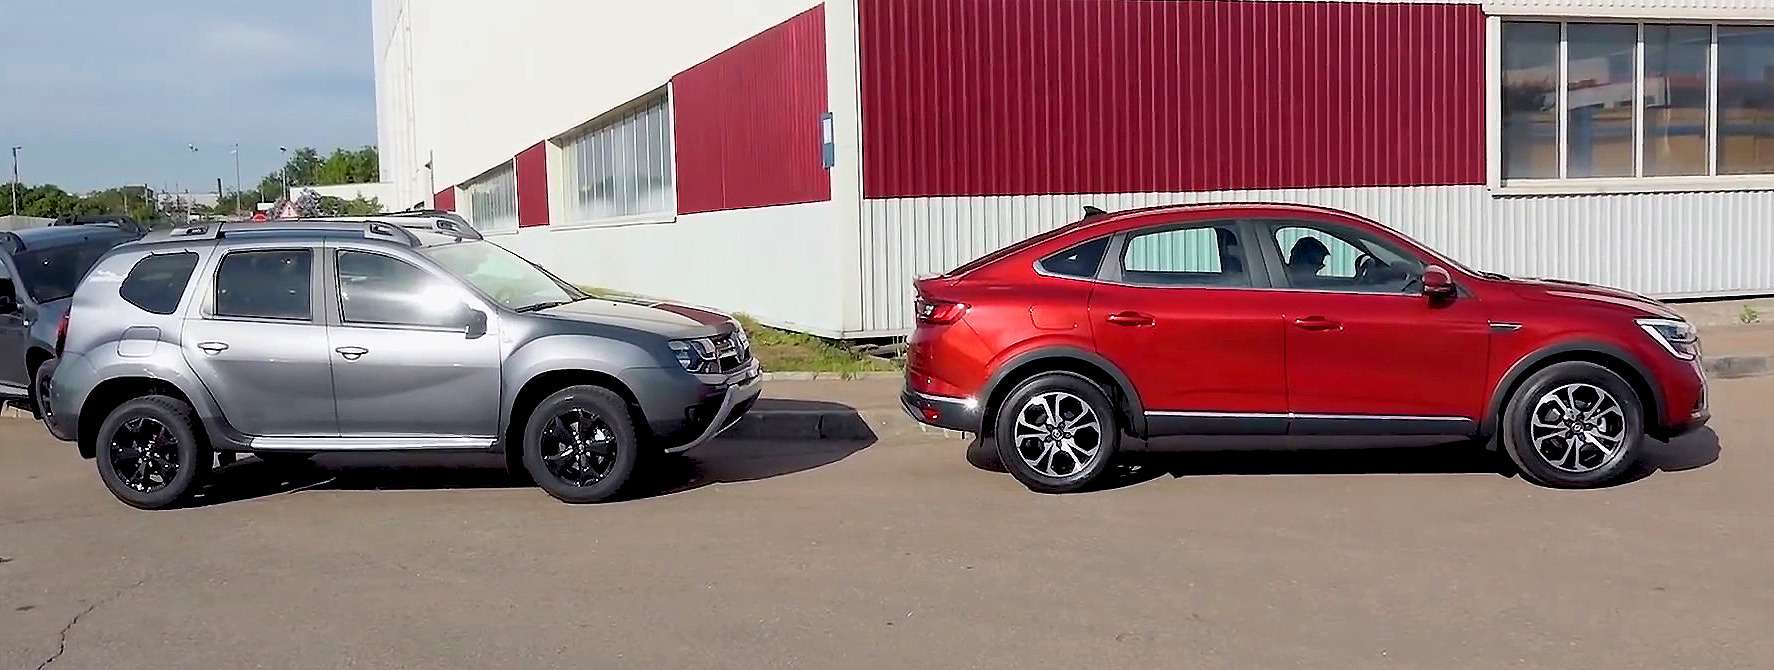 Renault Arkana: разбор отглавного редактора «Зарулем»— фото 976270